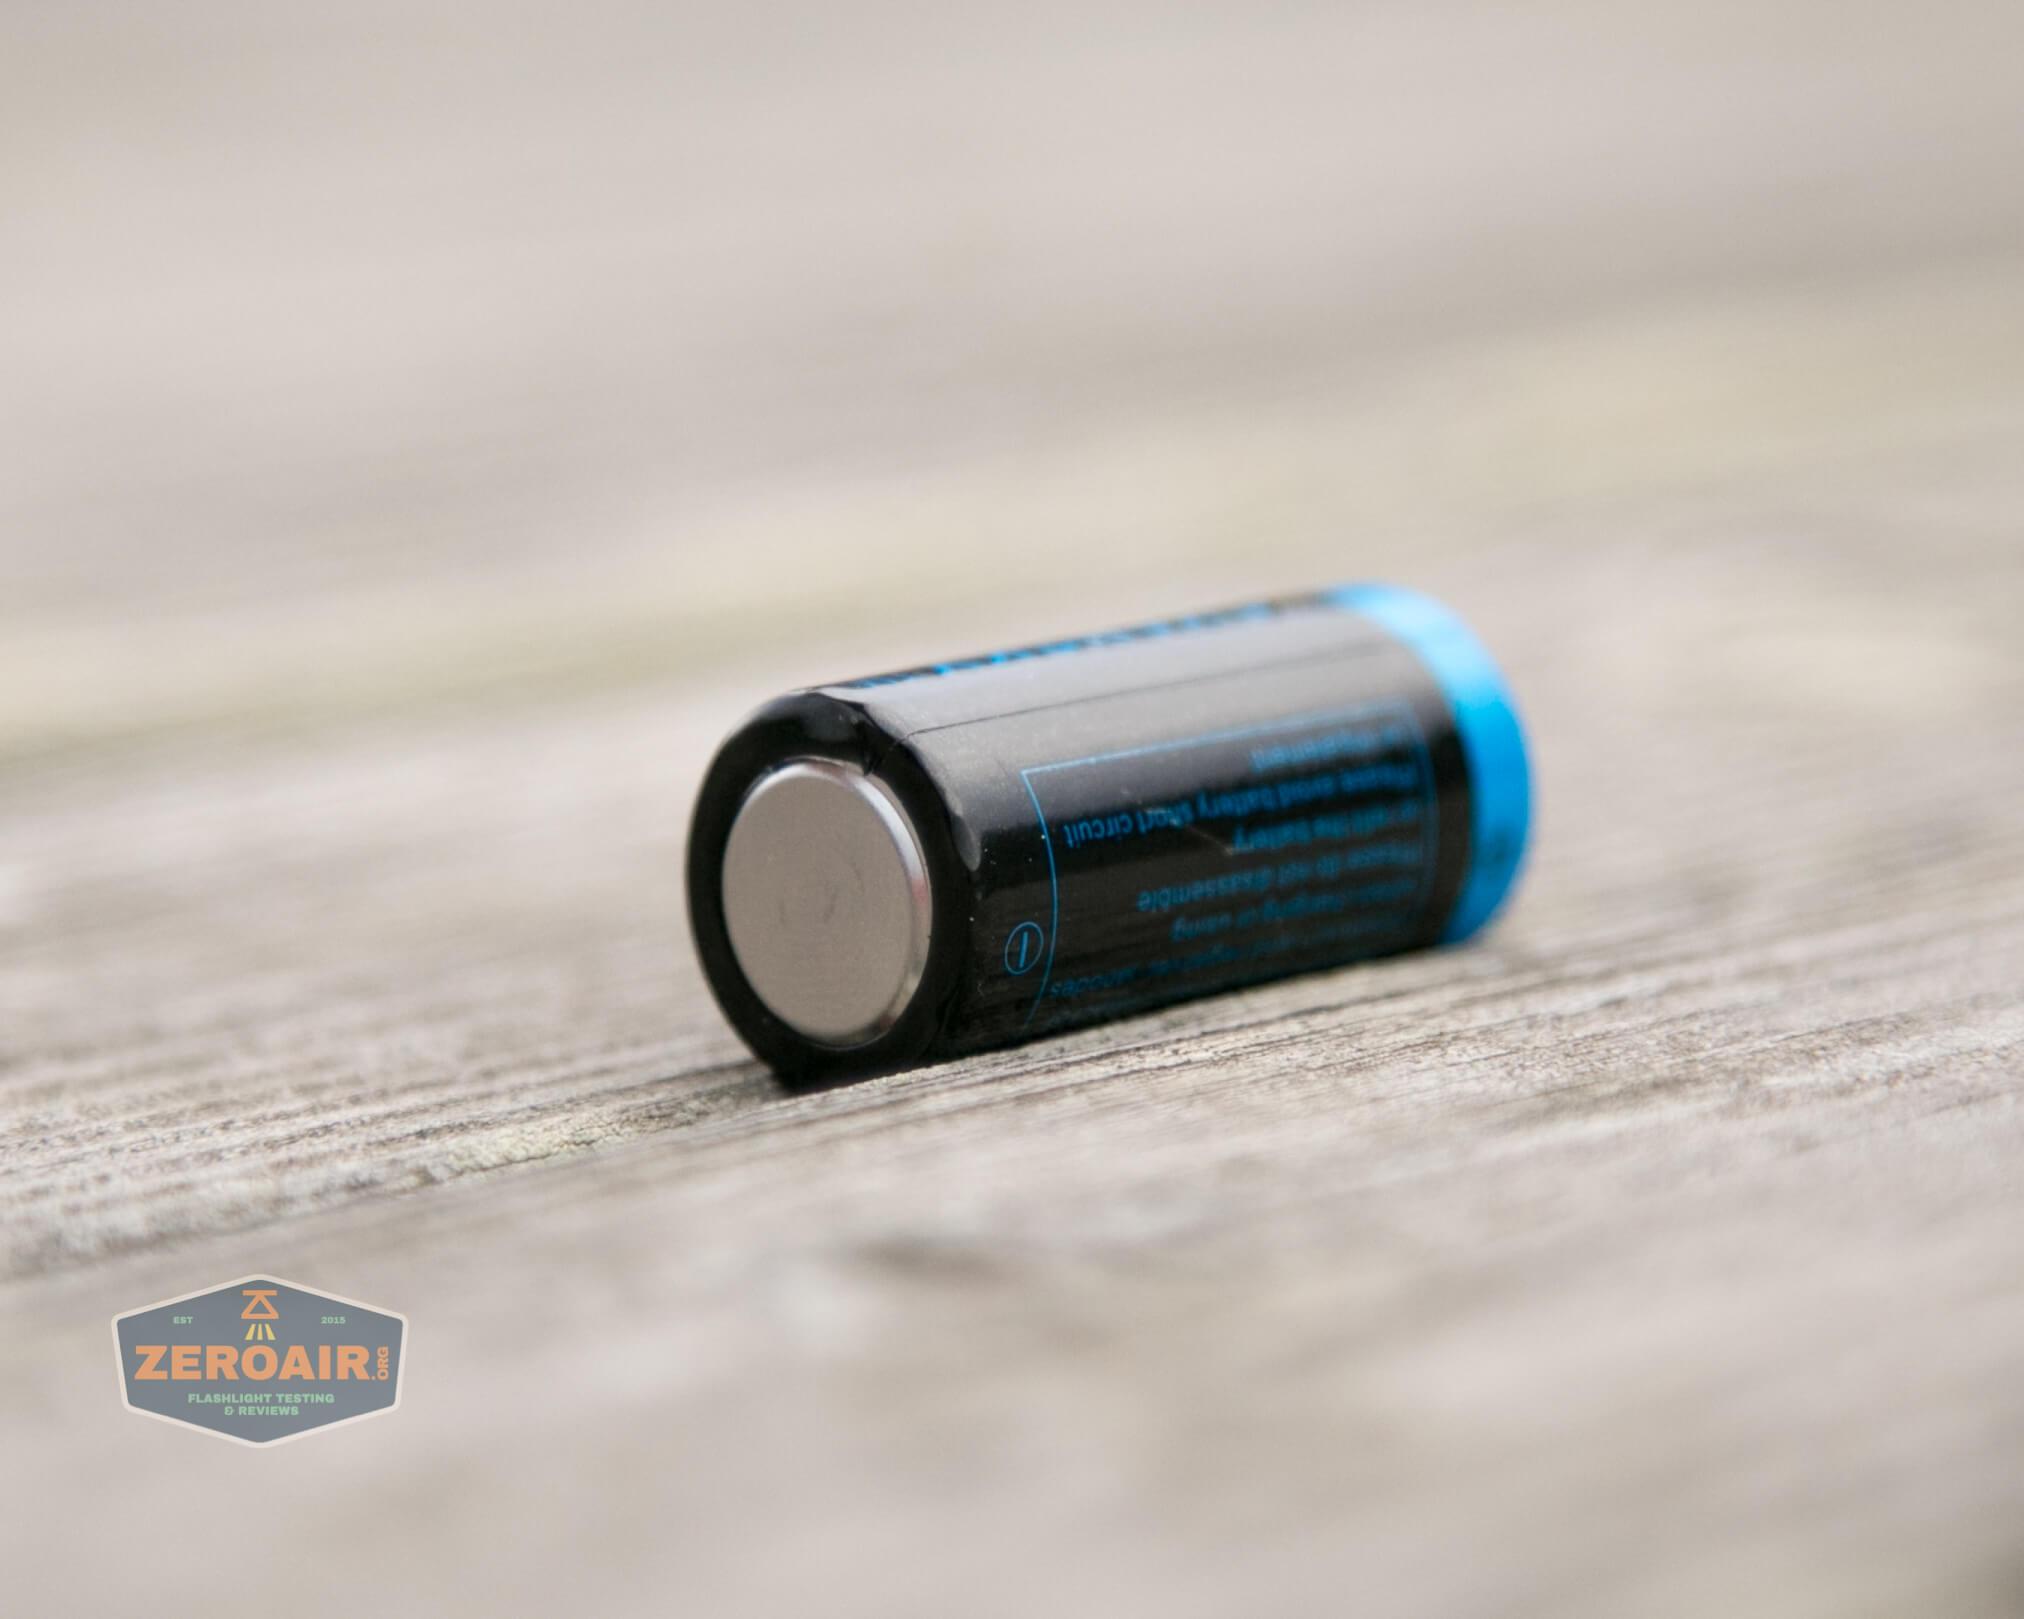 freasygears cyansky m3 titanium pocket flashlight 16340